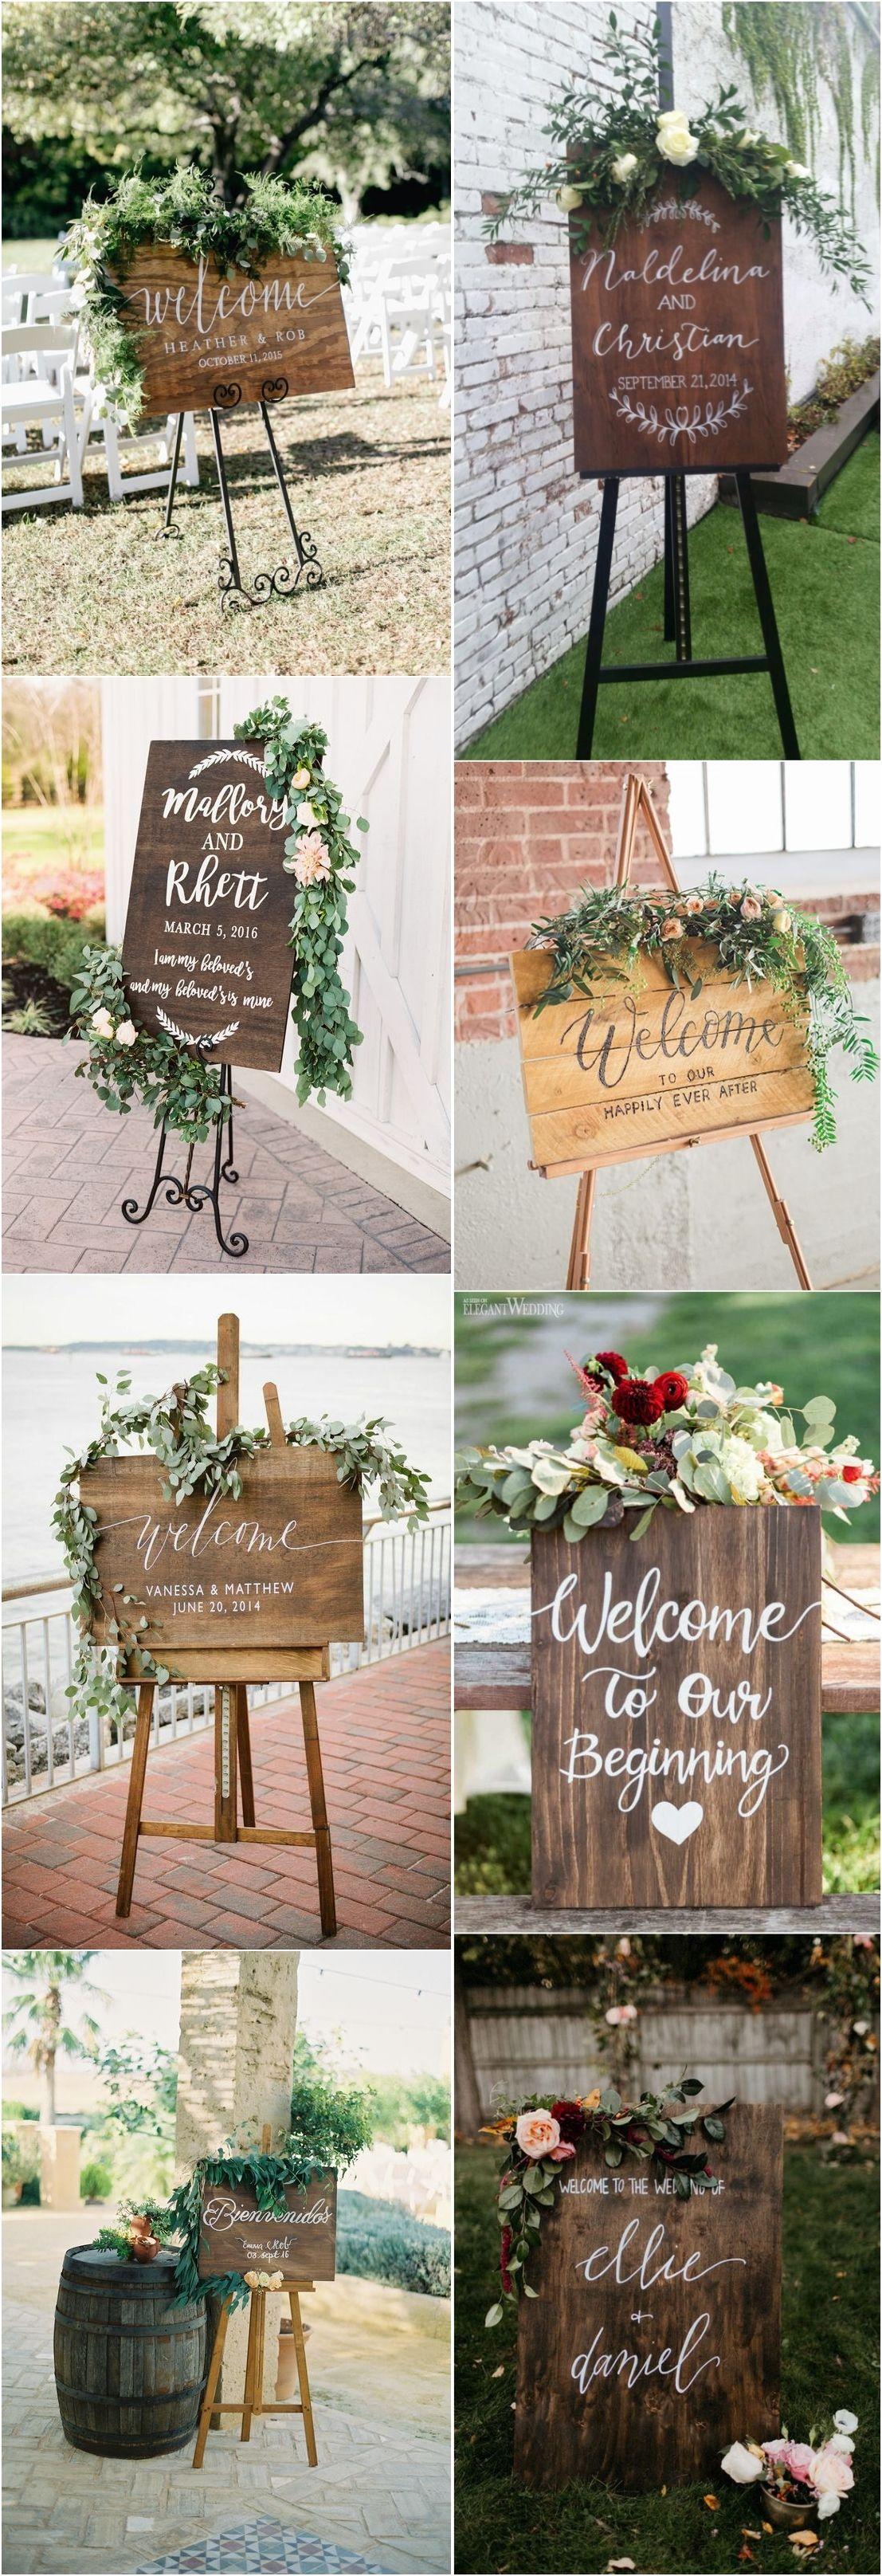 Rustic eucalyptus and peony topped wedding sign #rustic #wedding #weddingsign #green #greenwedding #weddingdecor http://www.deerpearlflowers.com/rustic-greenery-welcome-wedding-signs/